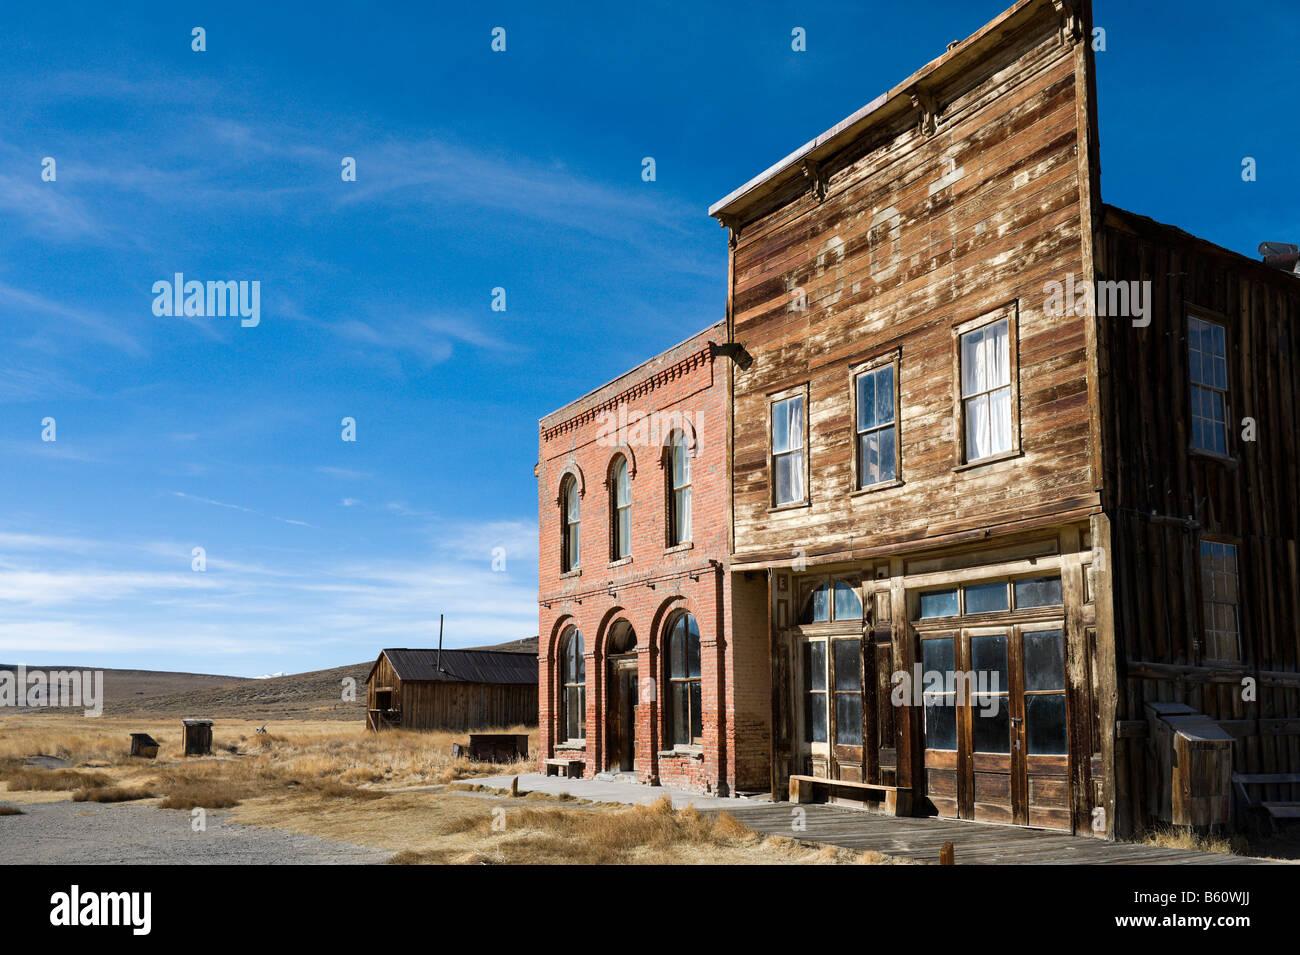 The Dechambeau Hotel & Post Office, Main Street, 19thC ghost town of Bodie, near Bridgepor,t Sierra Nevada Mountains, - Stock Image